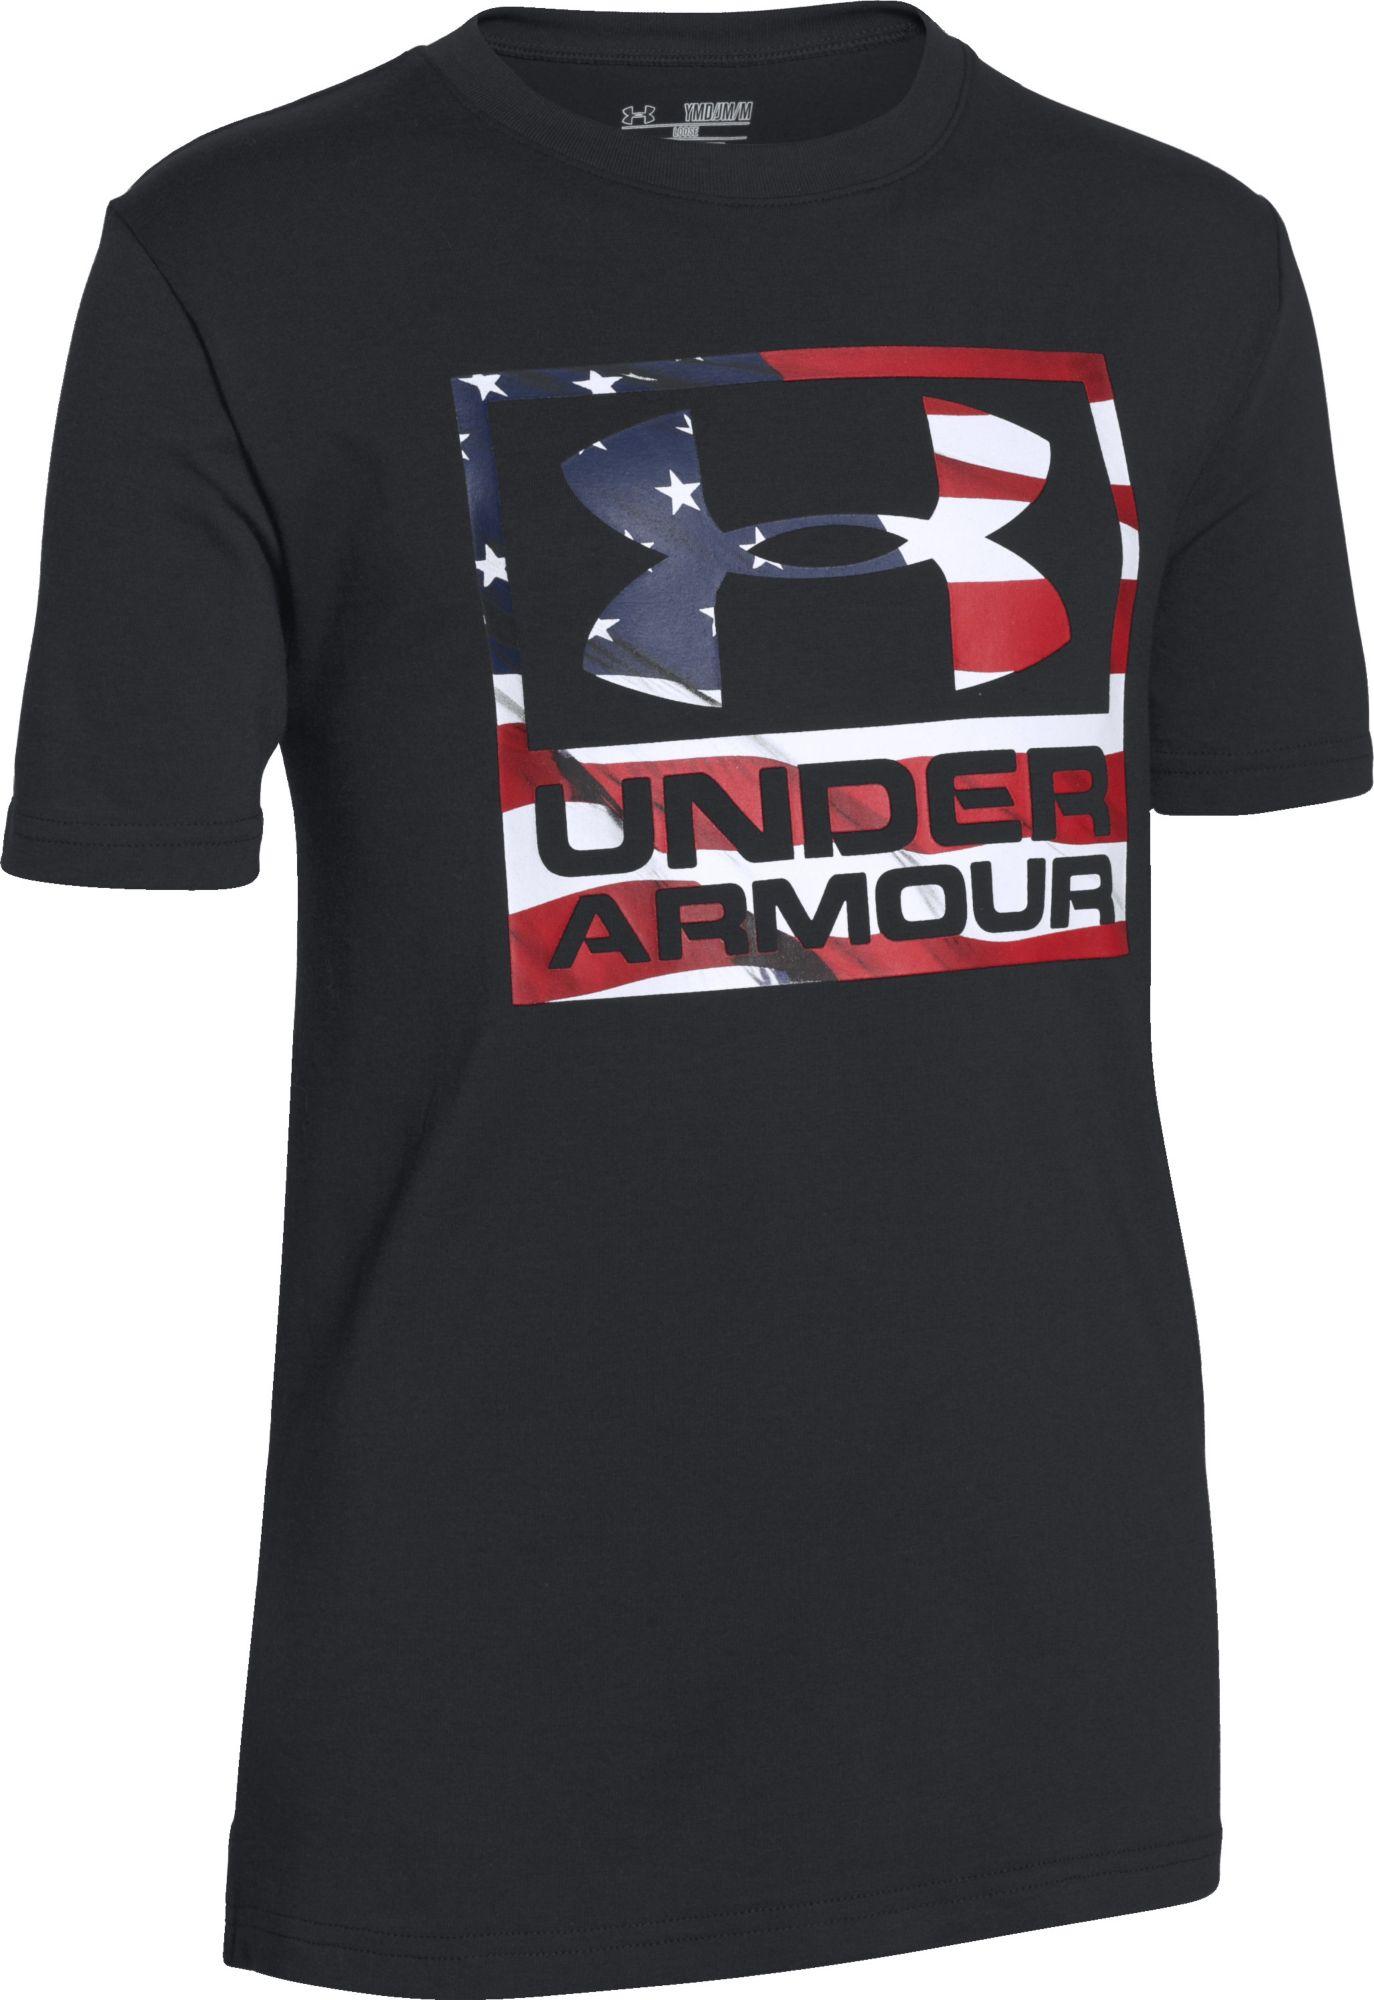 wholesale dealer 5ee18 4fd75 Under Armour Boys Big Flag Logo T Shirt DICKS Sporting Goods ...